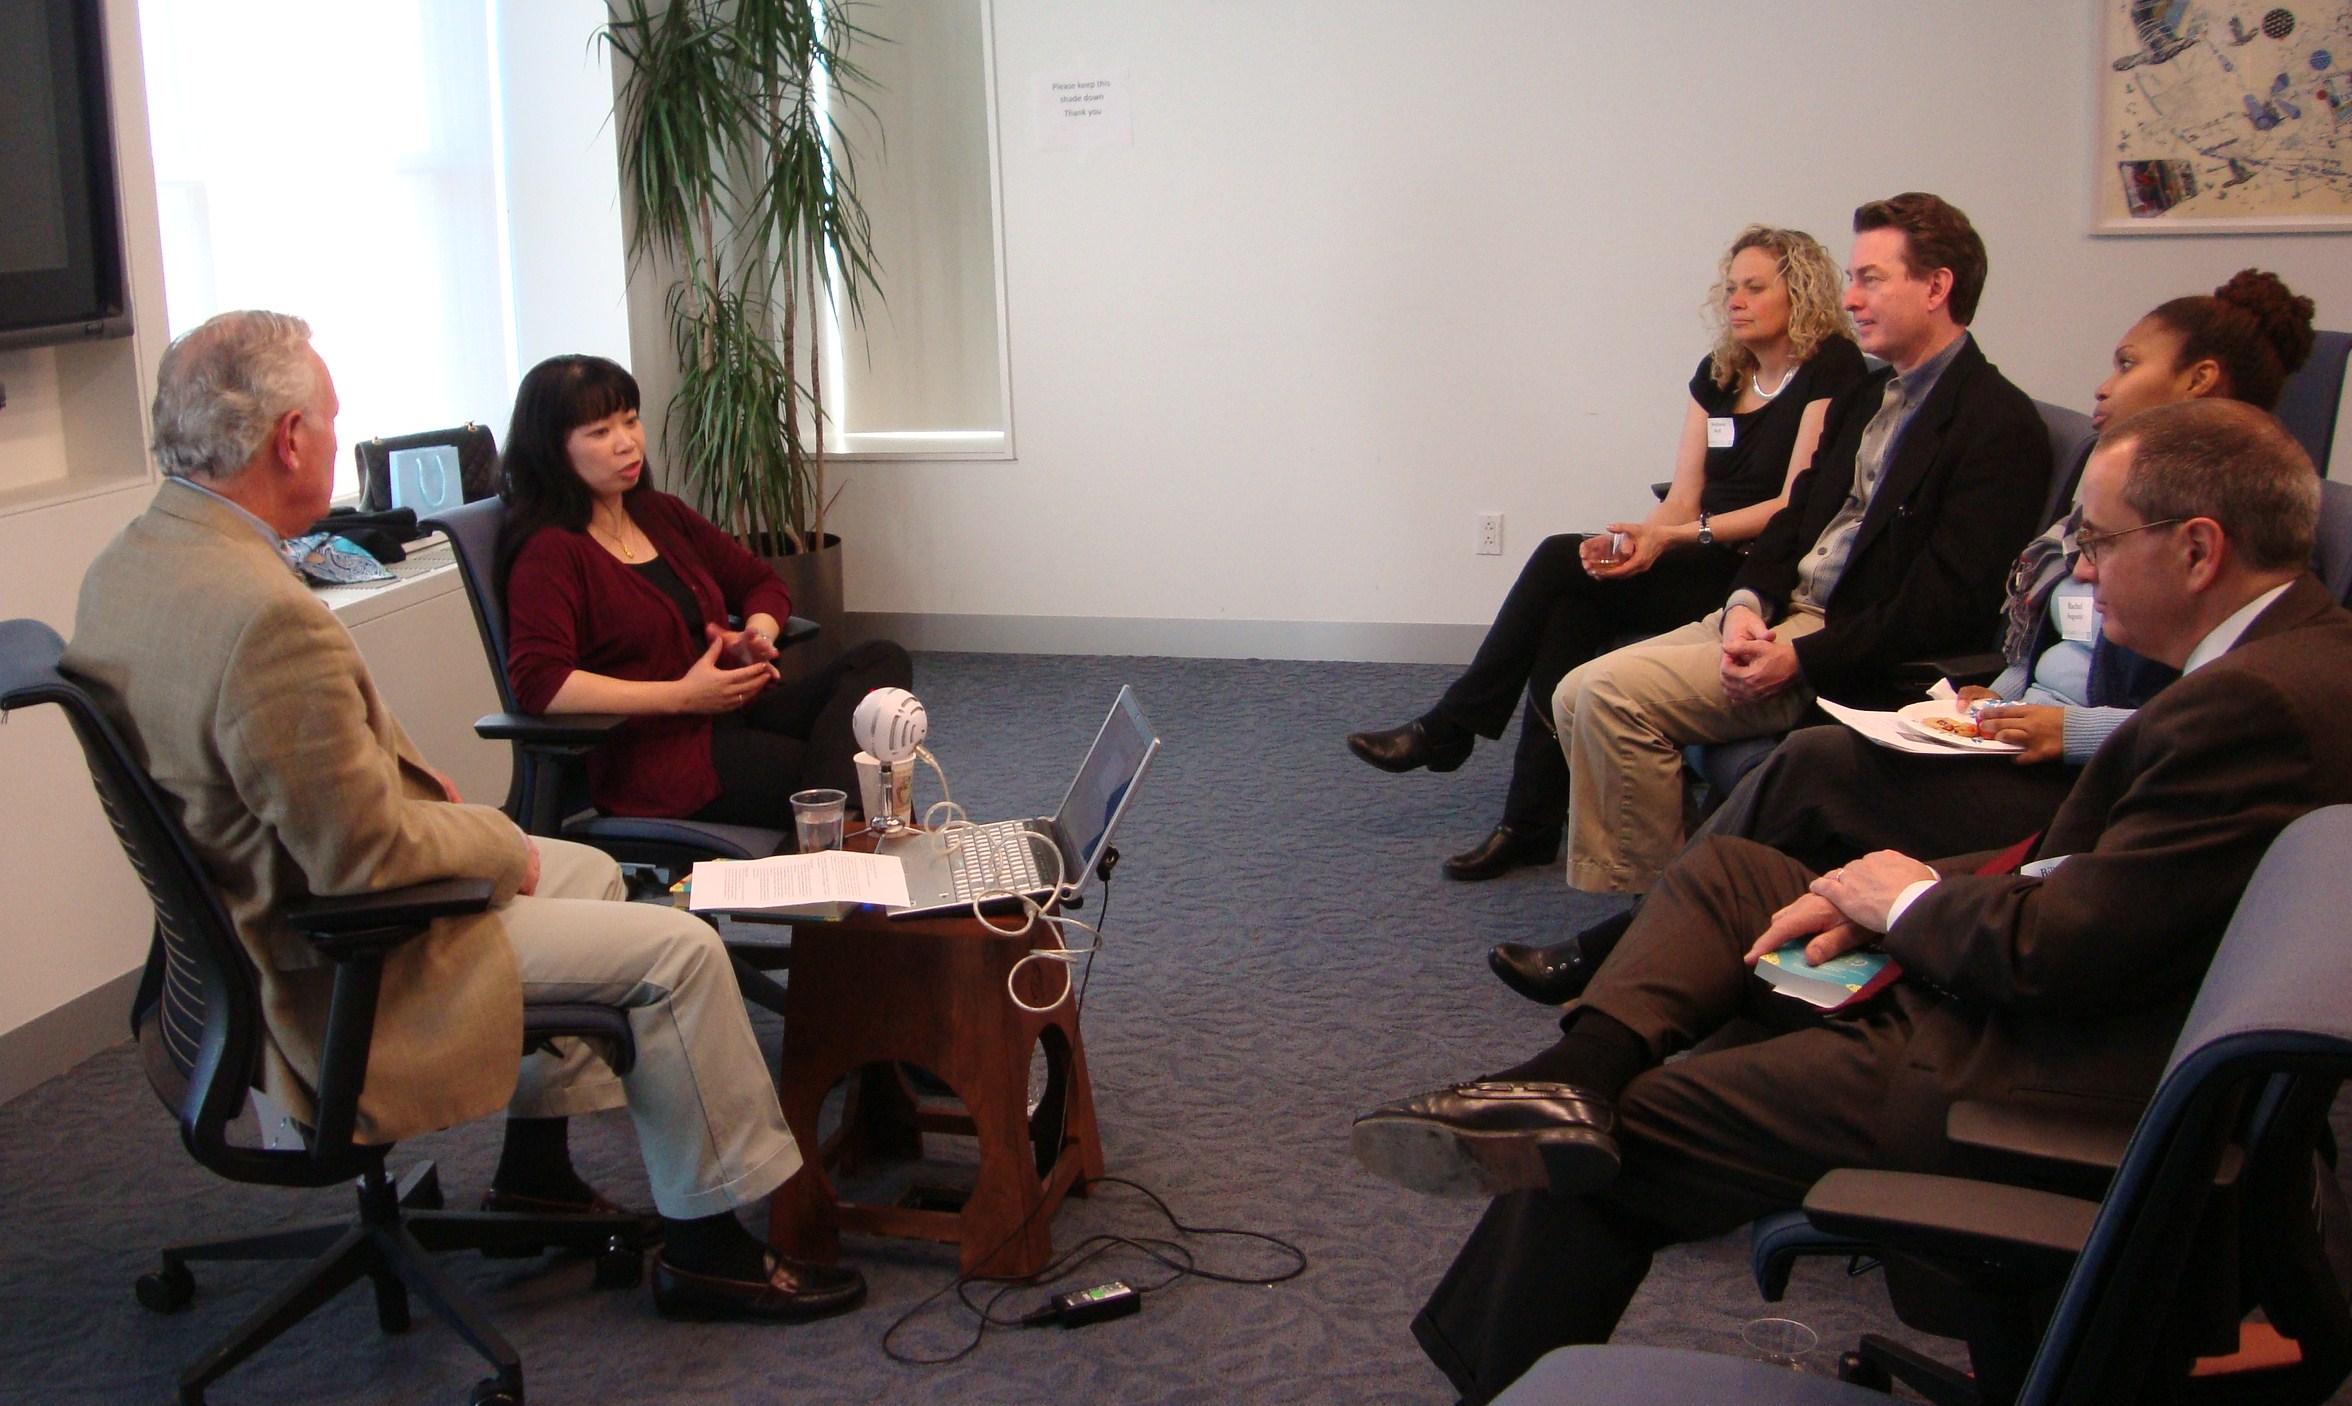 Jean_Kwok_Interview_Columbia Alumni_Fiction Foundry